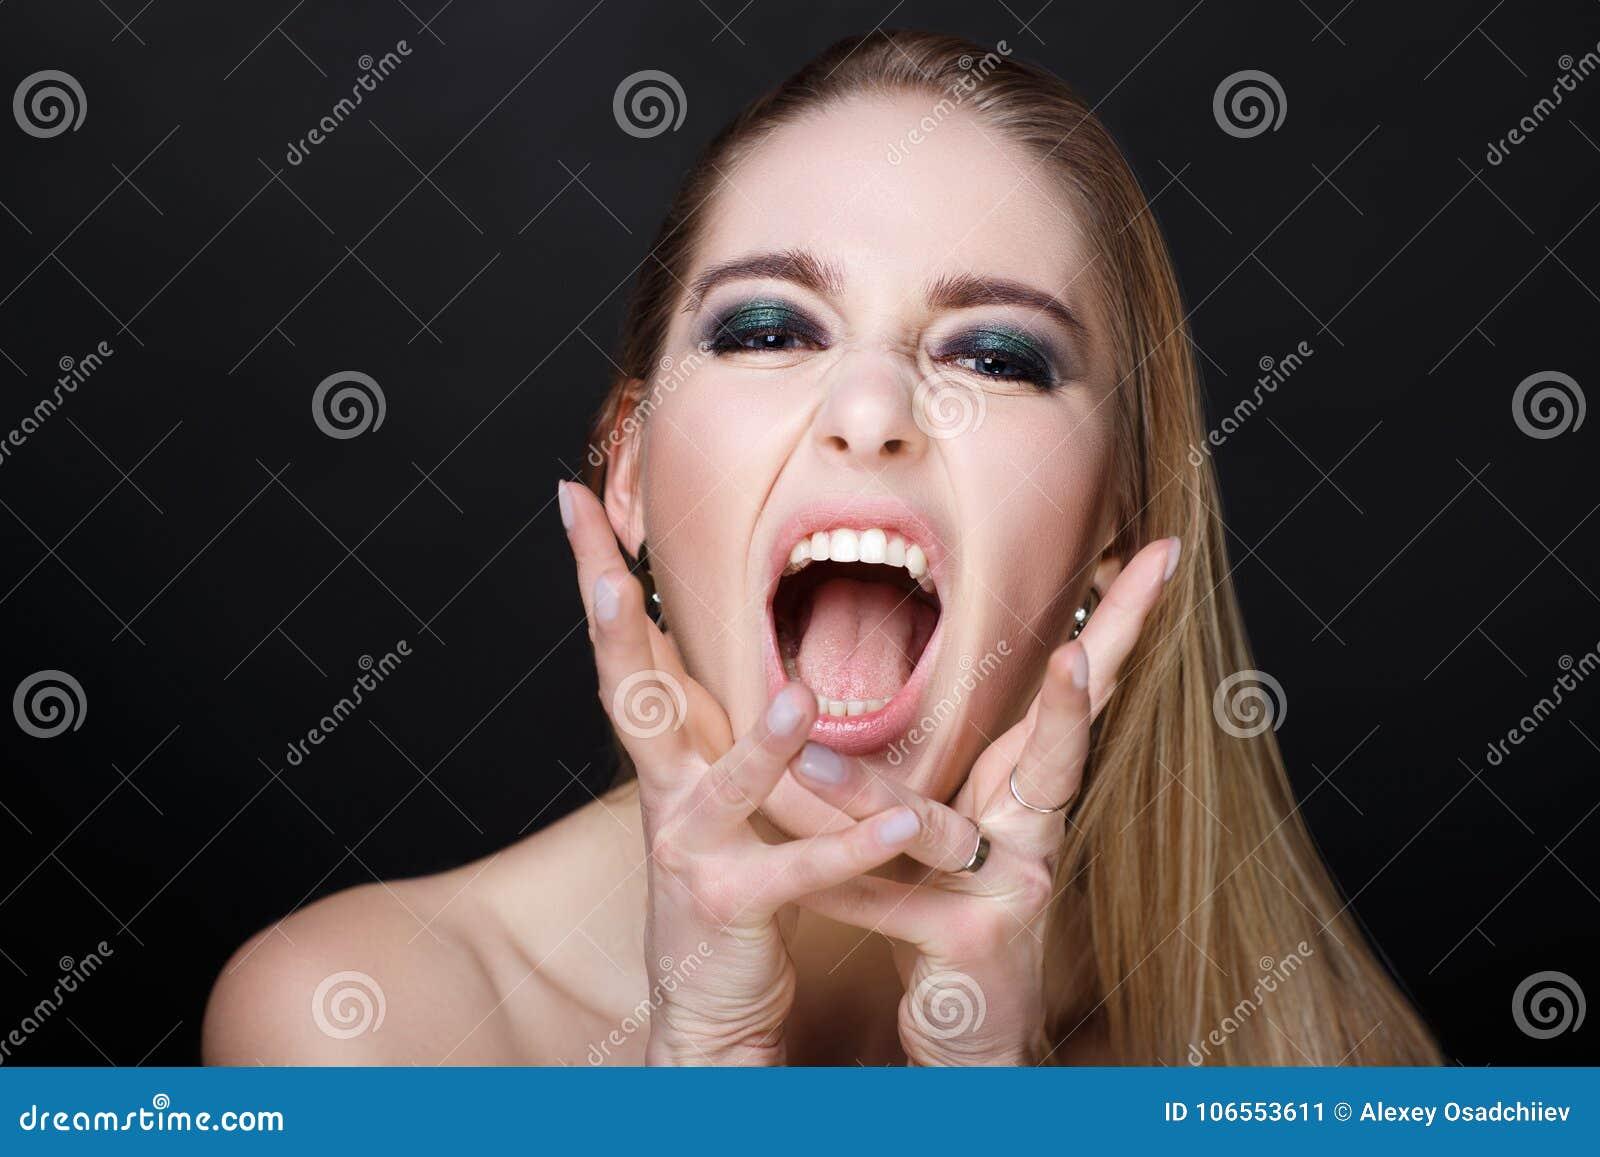 Громко кричат когда кончают, женскую попу и оргазм